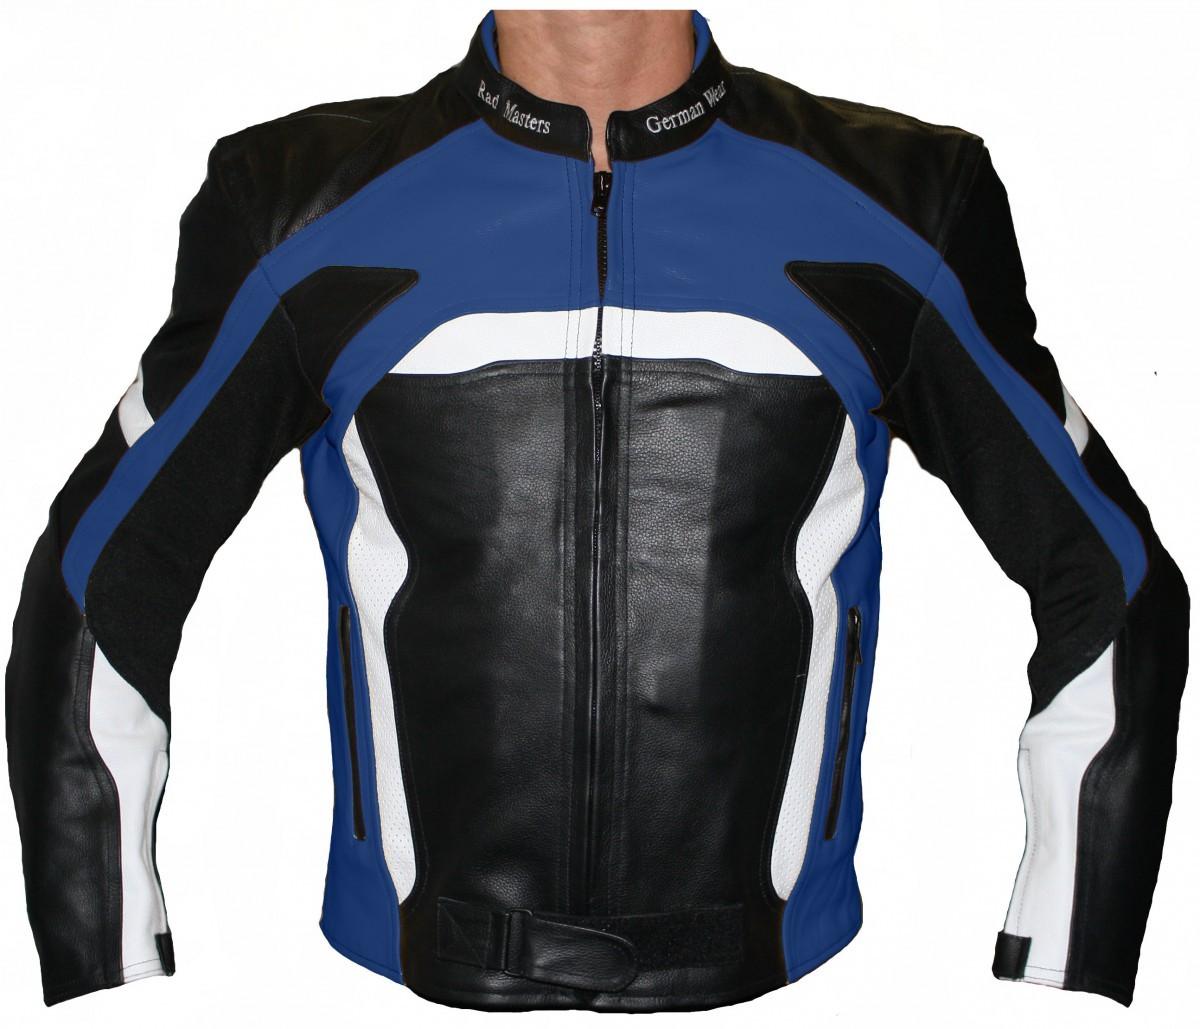 Biker Germanwear Lederjacke Schwarzblau Rindsleder Motorradjacke BorxdeCW